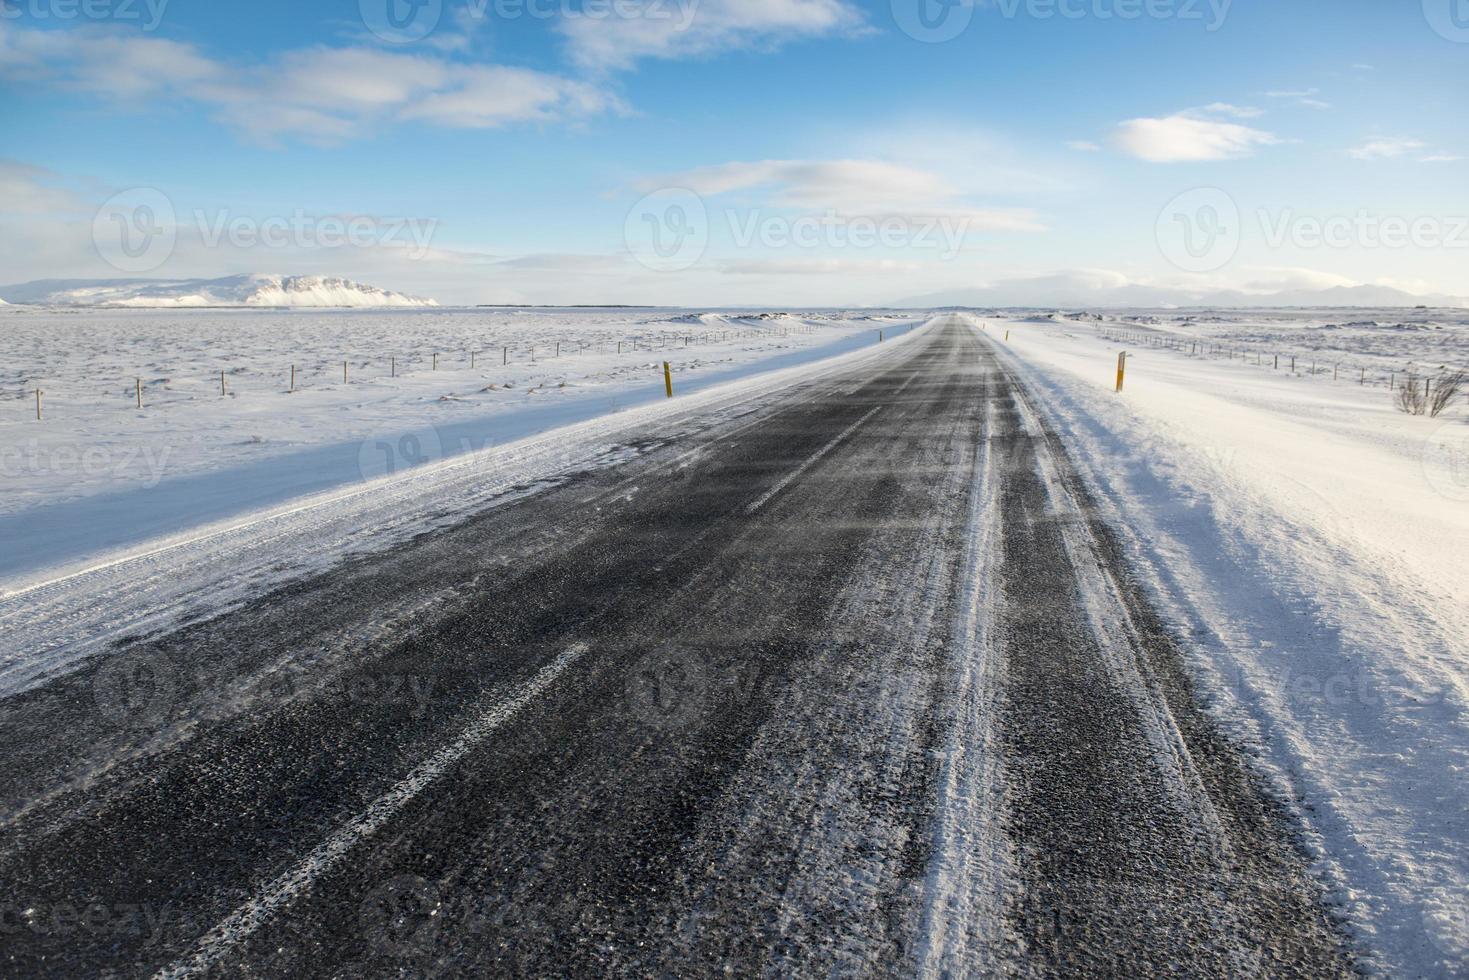 winter asfaltweg vallende sneeuw, ijsland foto